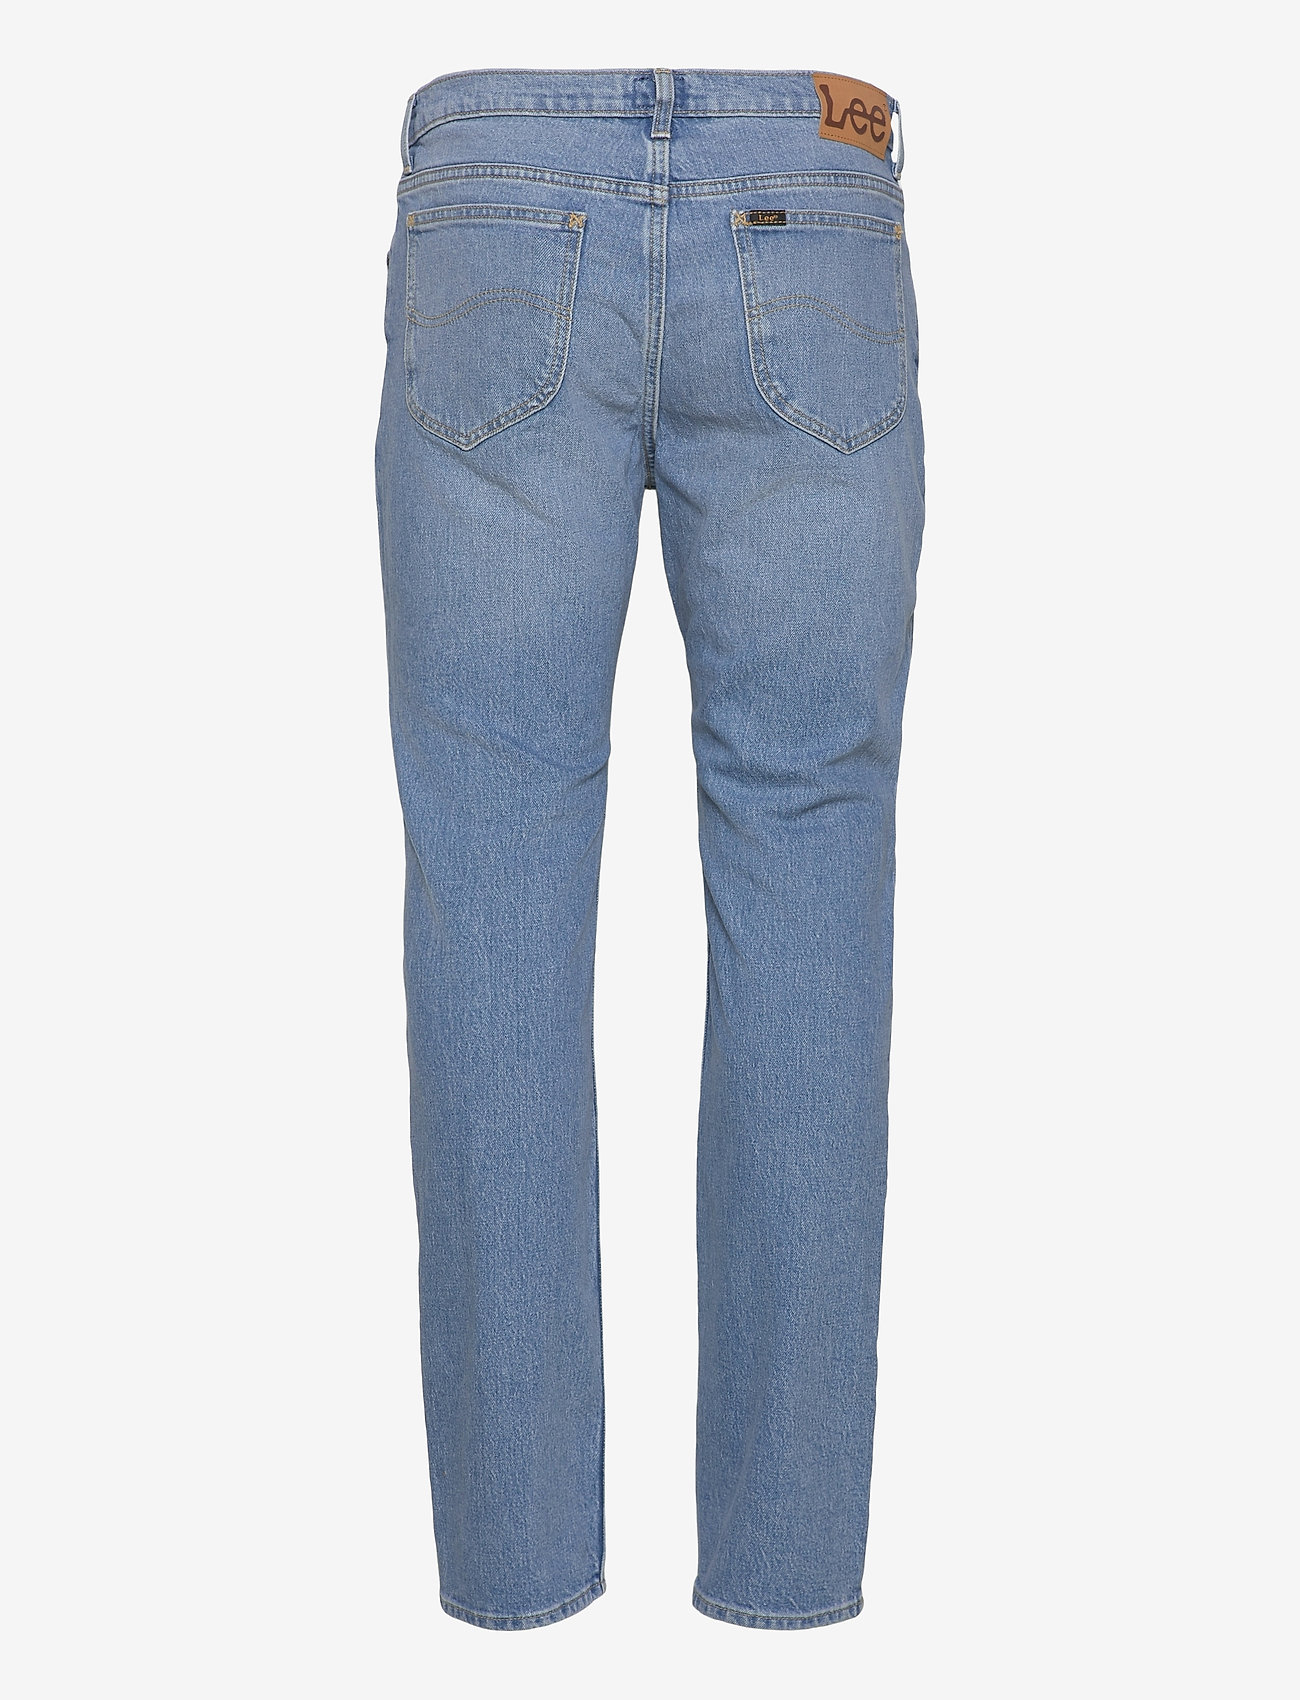 Lee Jeans - RIDER - slim jeans - mid soho - 1